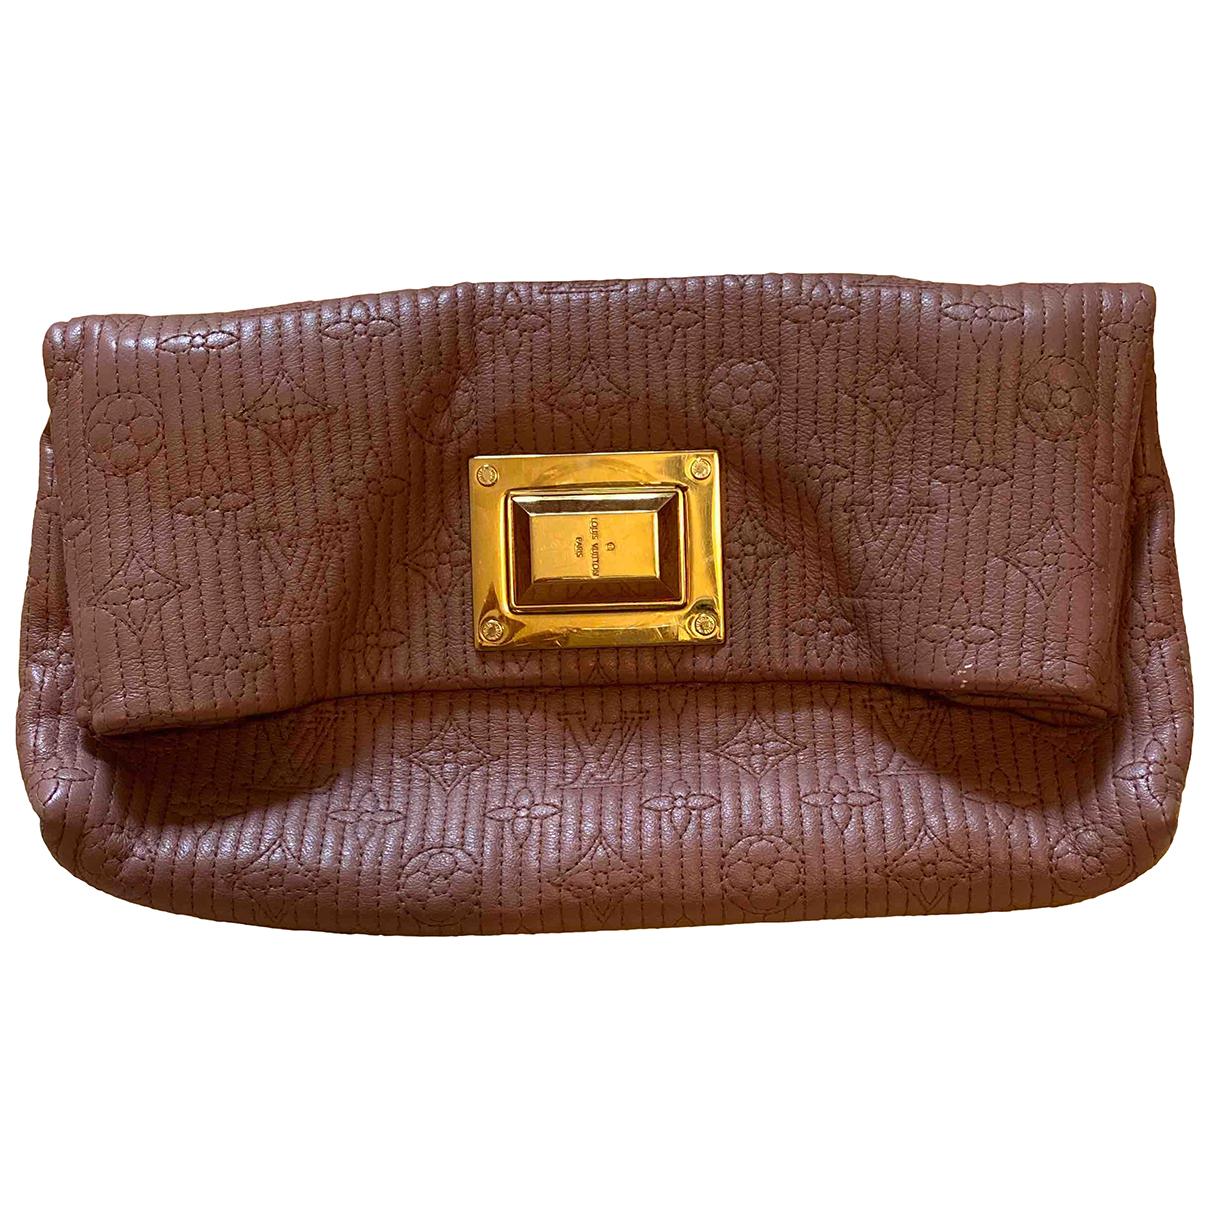 Louis Vuitton Altaïr Pink Leather Clutch bag for Women N